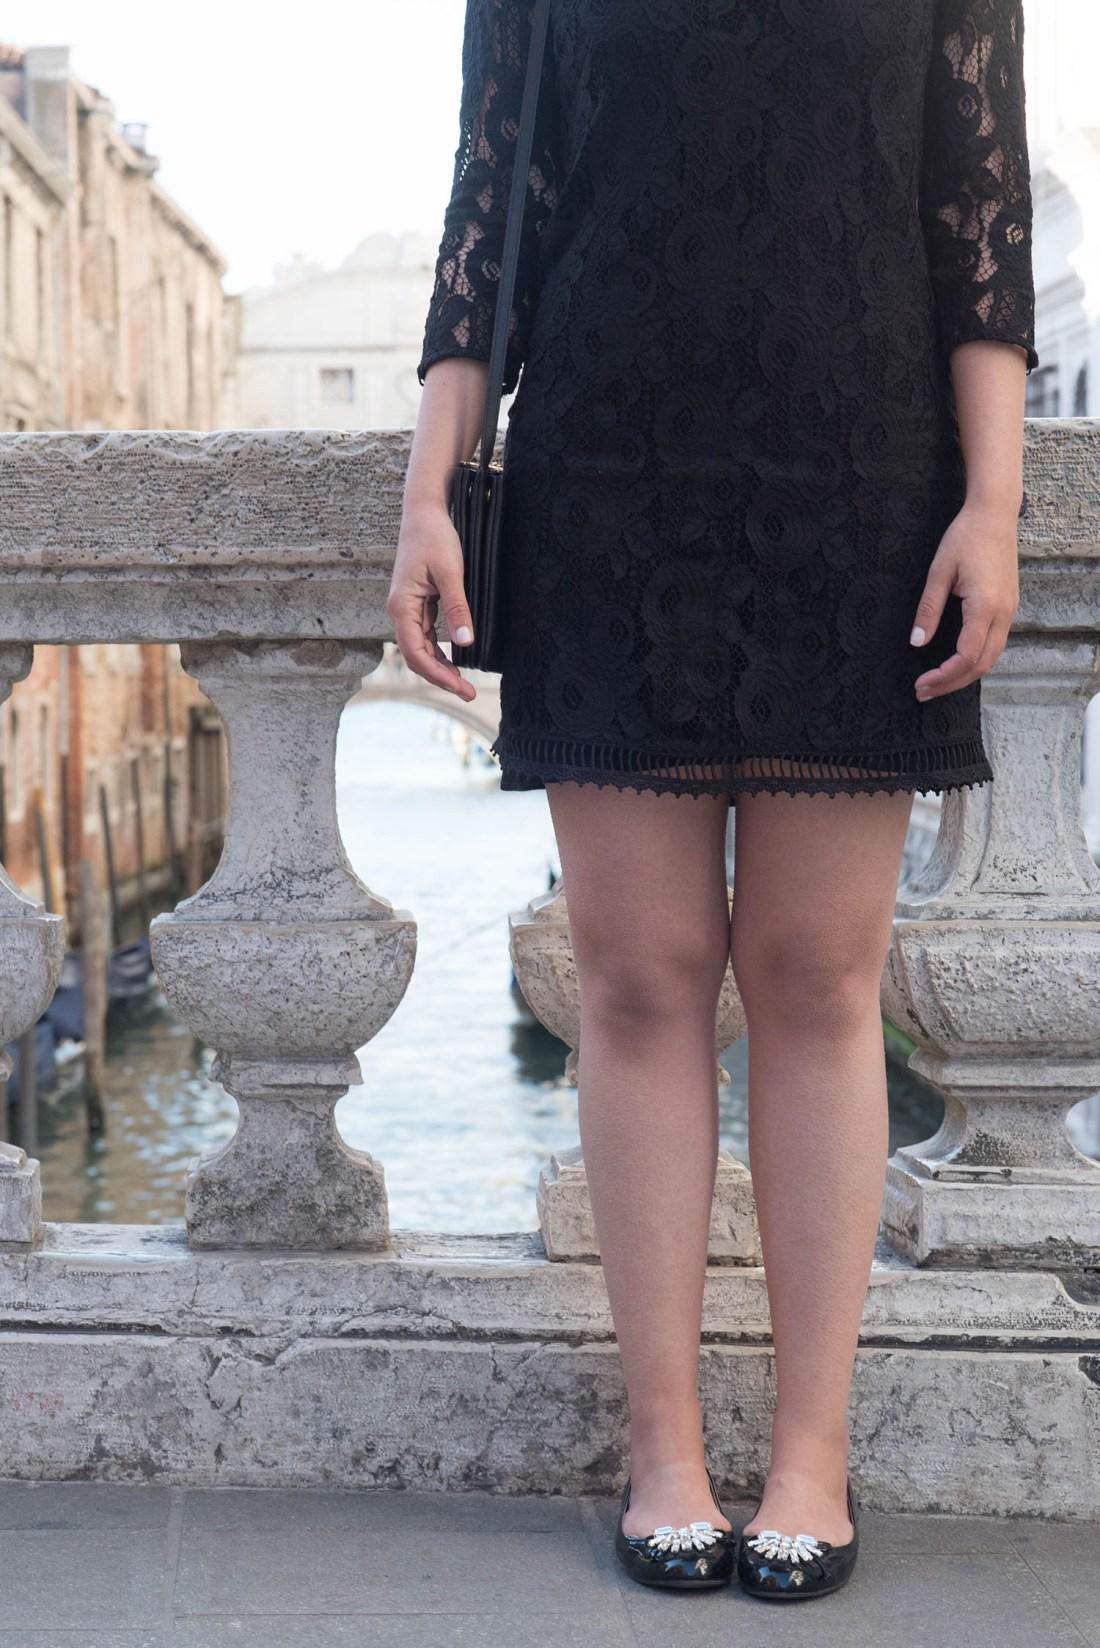 Outfit details on Winnipeg fashion blogger Cee Fardoe of Coco & Vera, wearing Miu Miu patent flats, a Gentlefawn lace dress and Celine trio bag